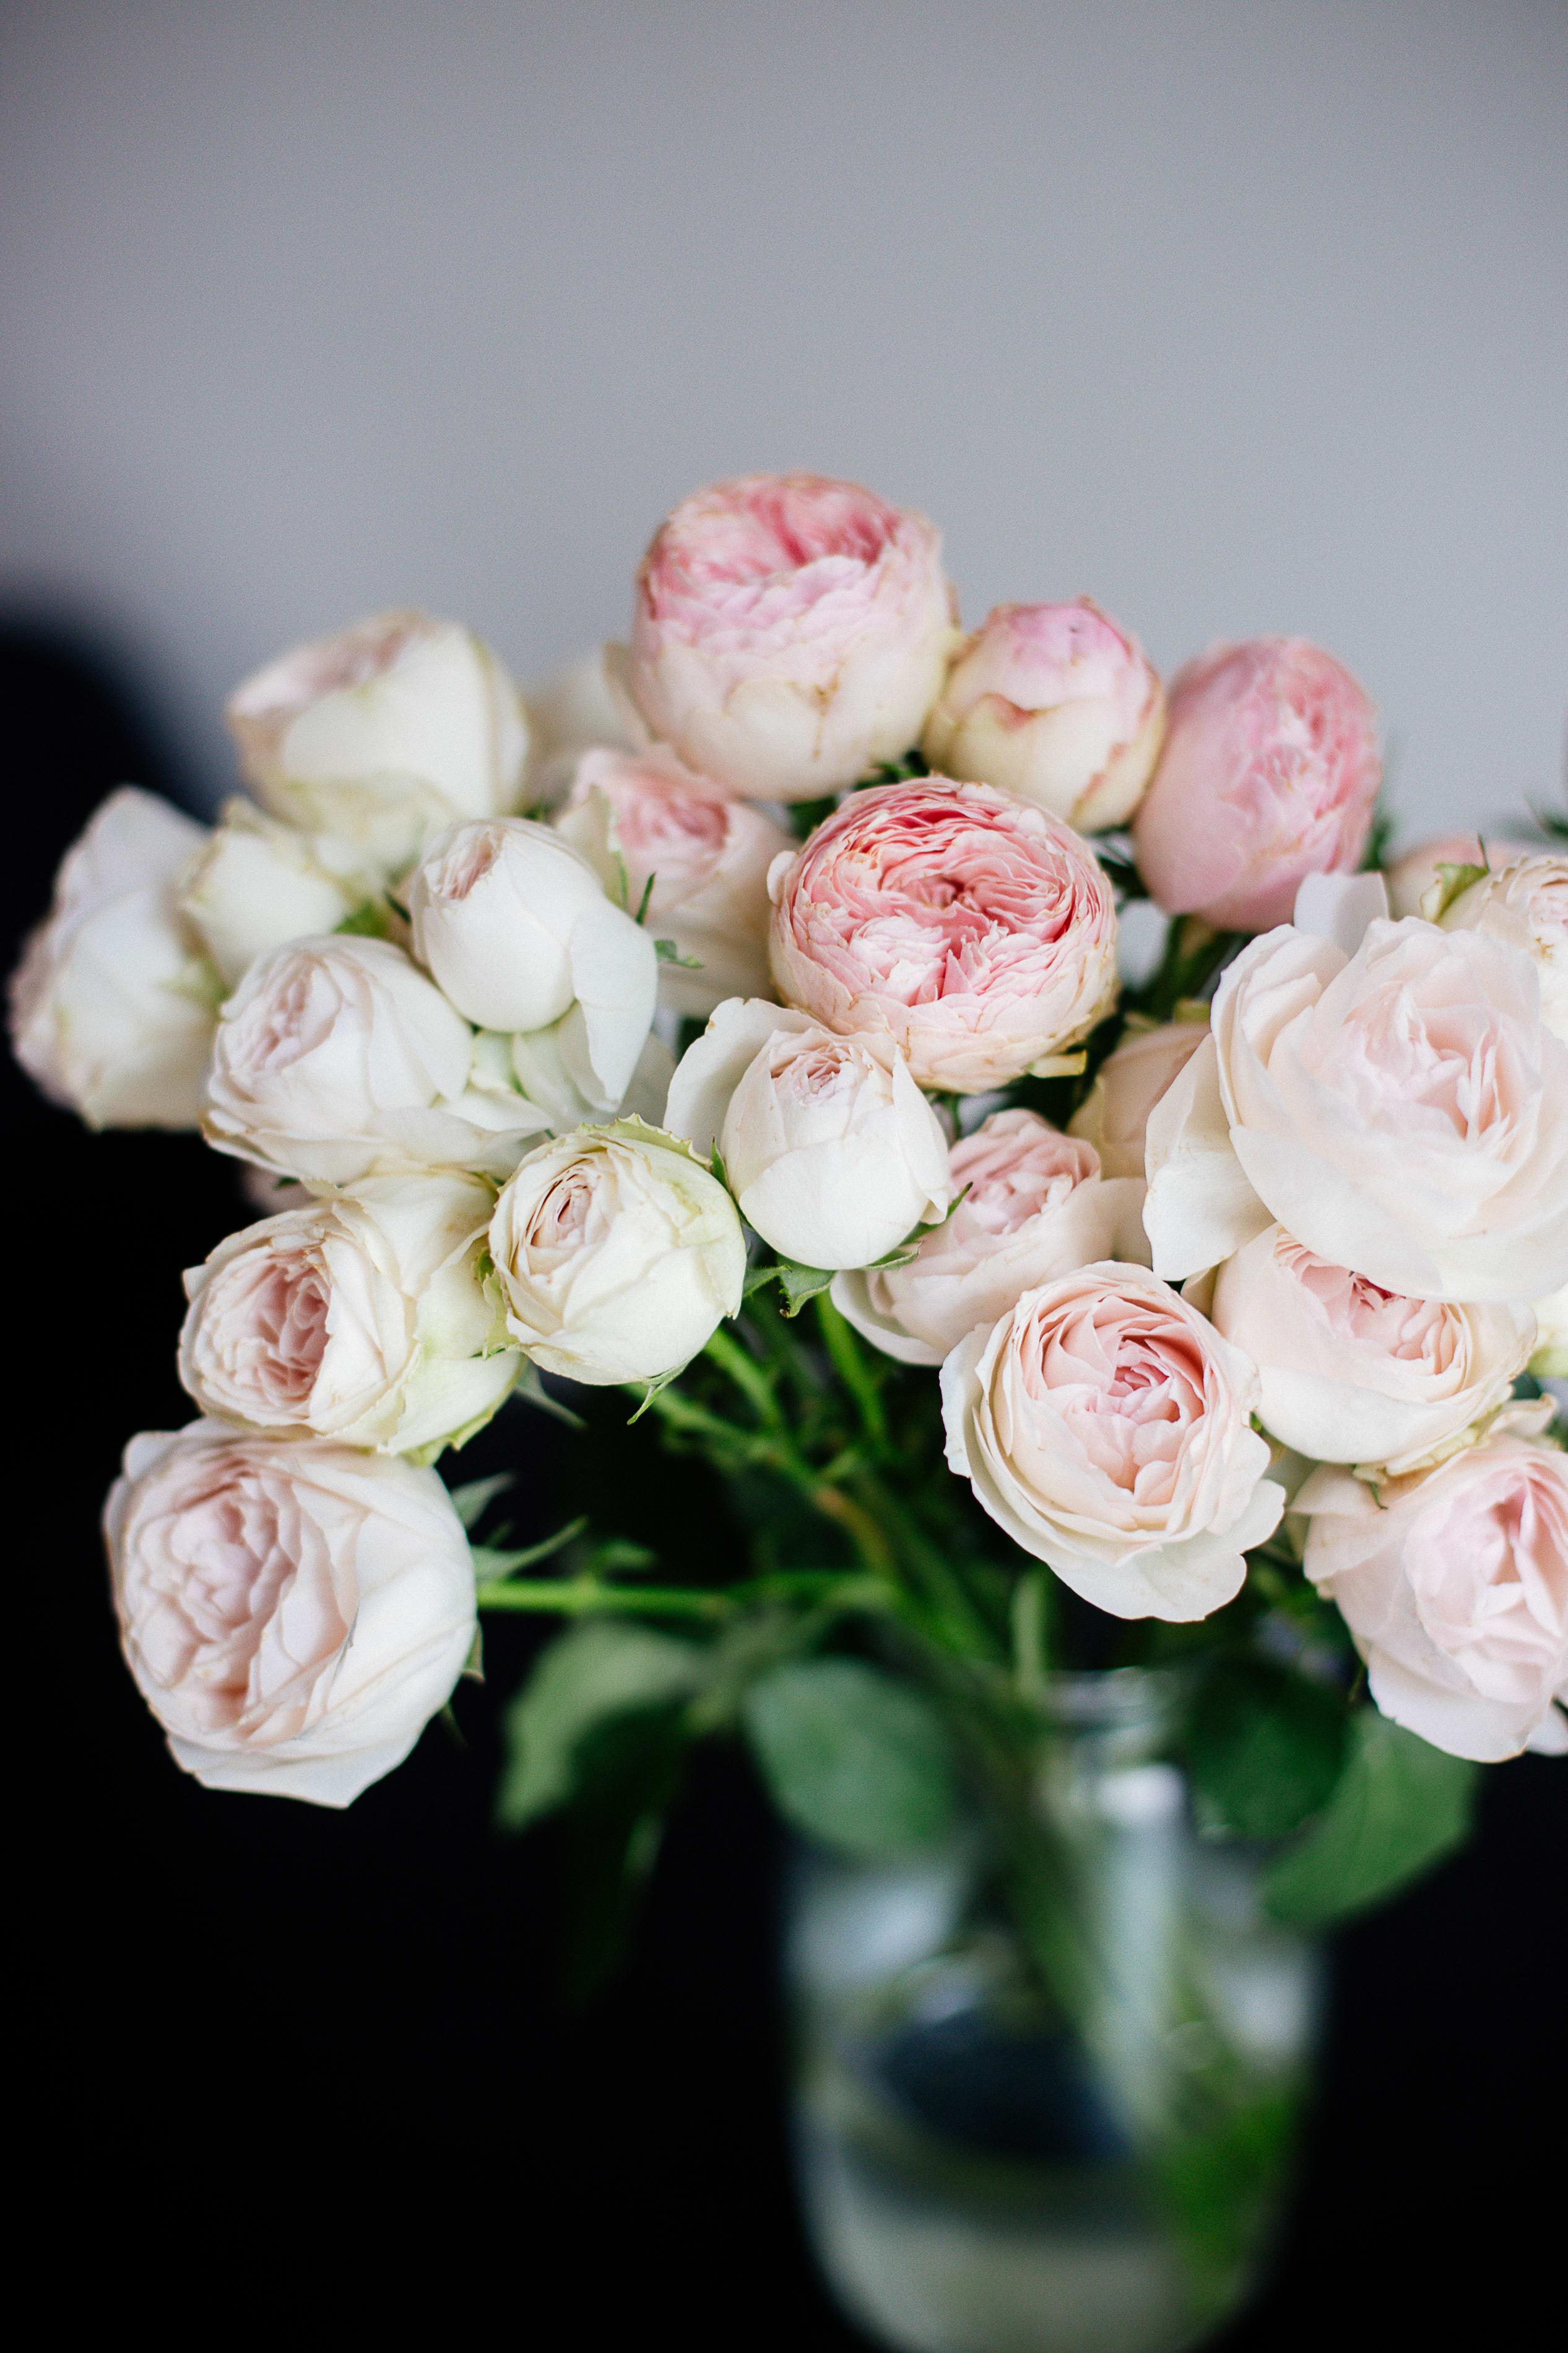 Merveilleux Elizabethu0027s Flowers